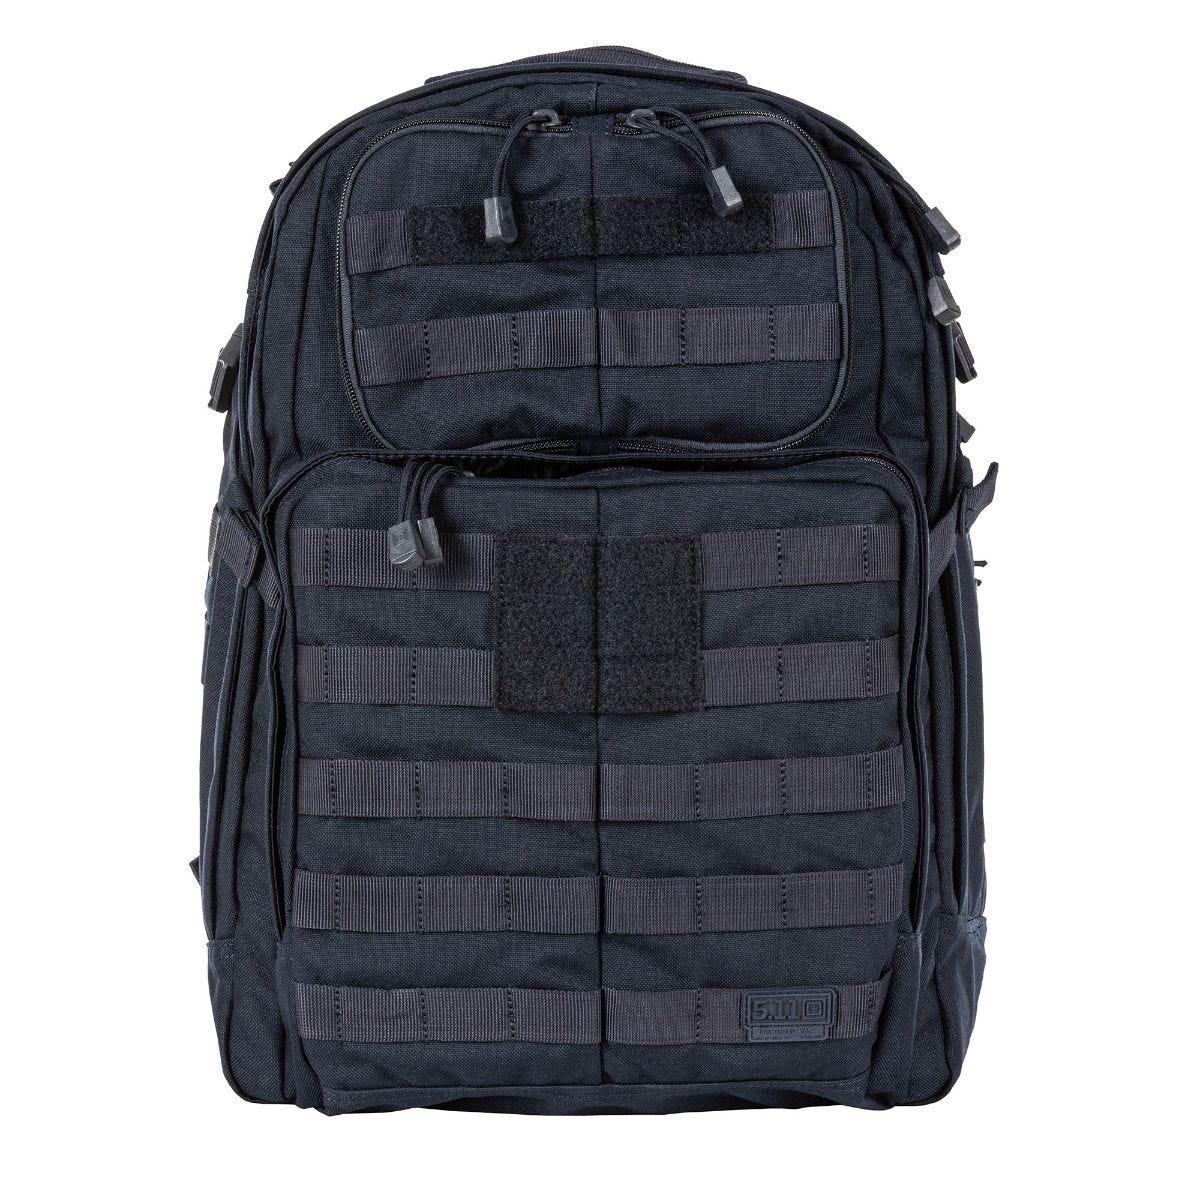 Balo 5.11 Tactical Rush 24 – Dark Navy